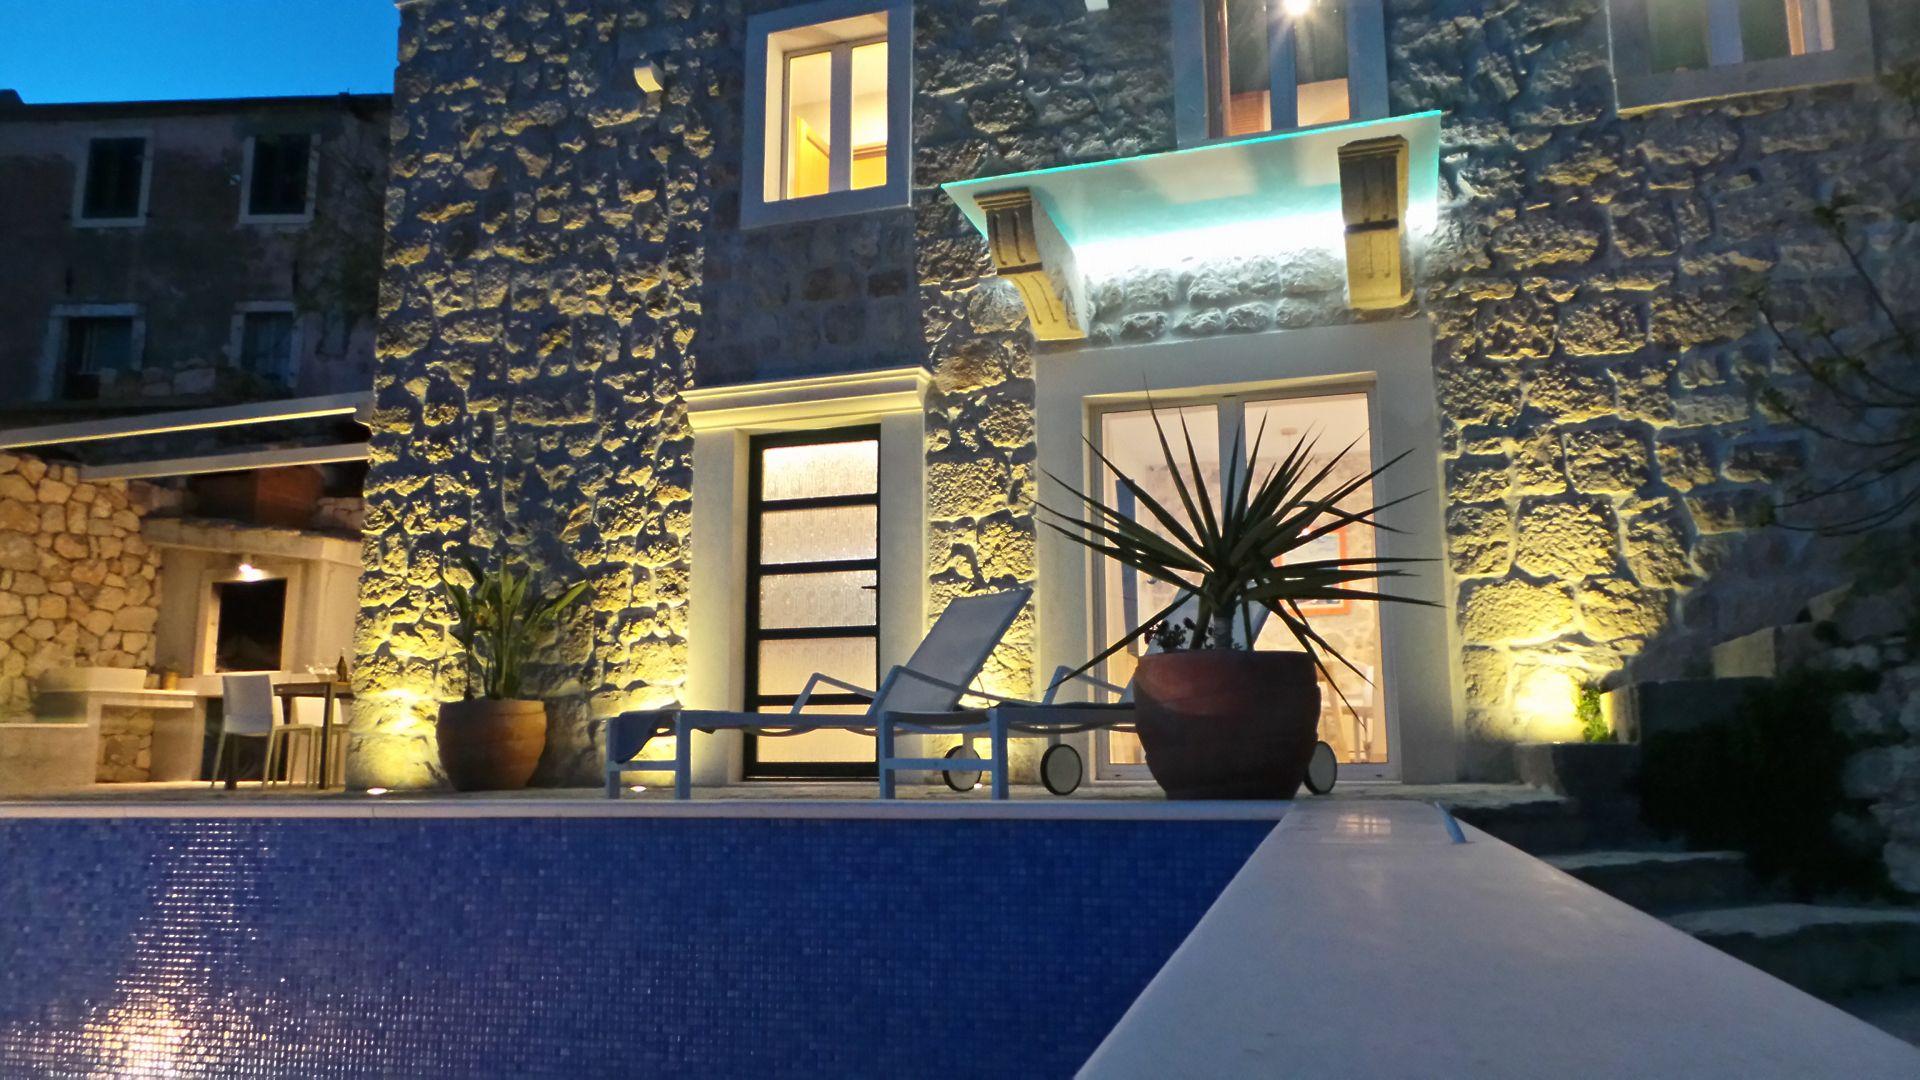 Tanja - Tucepi - Maisons de repos, villas Croatie